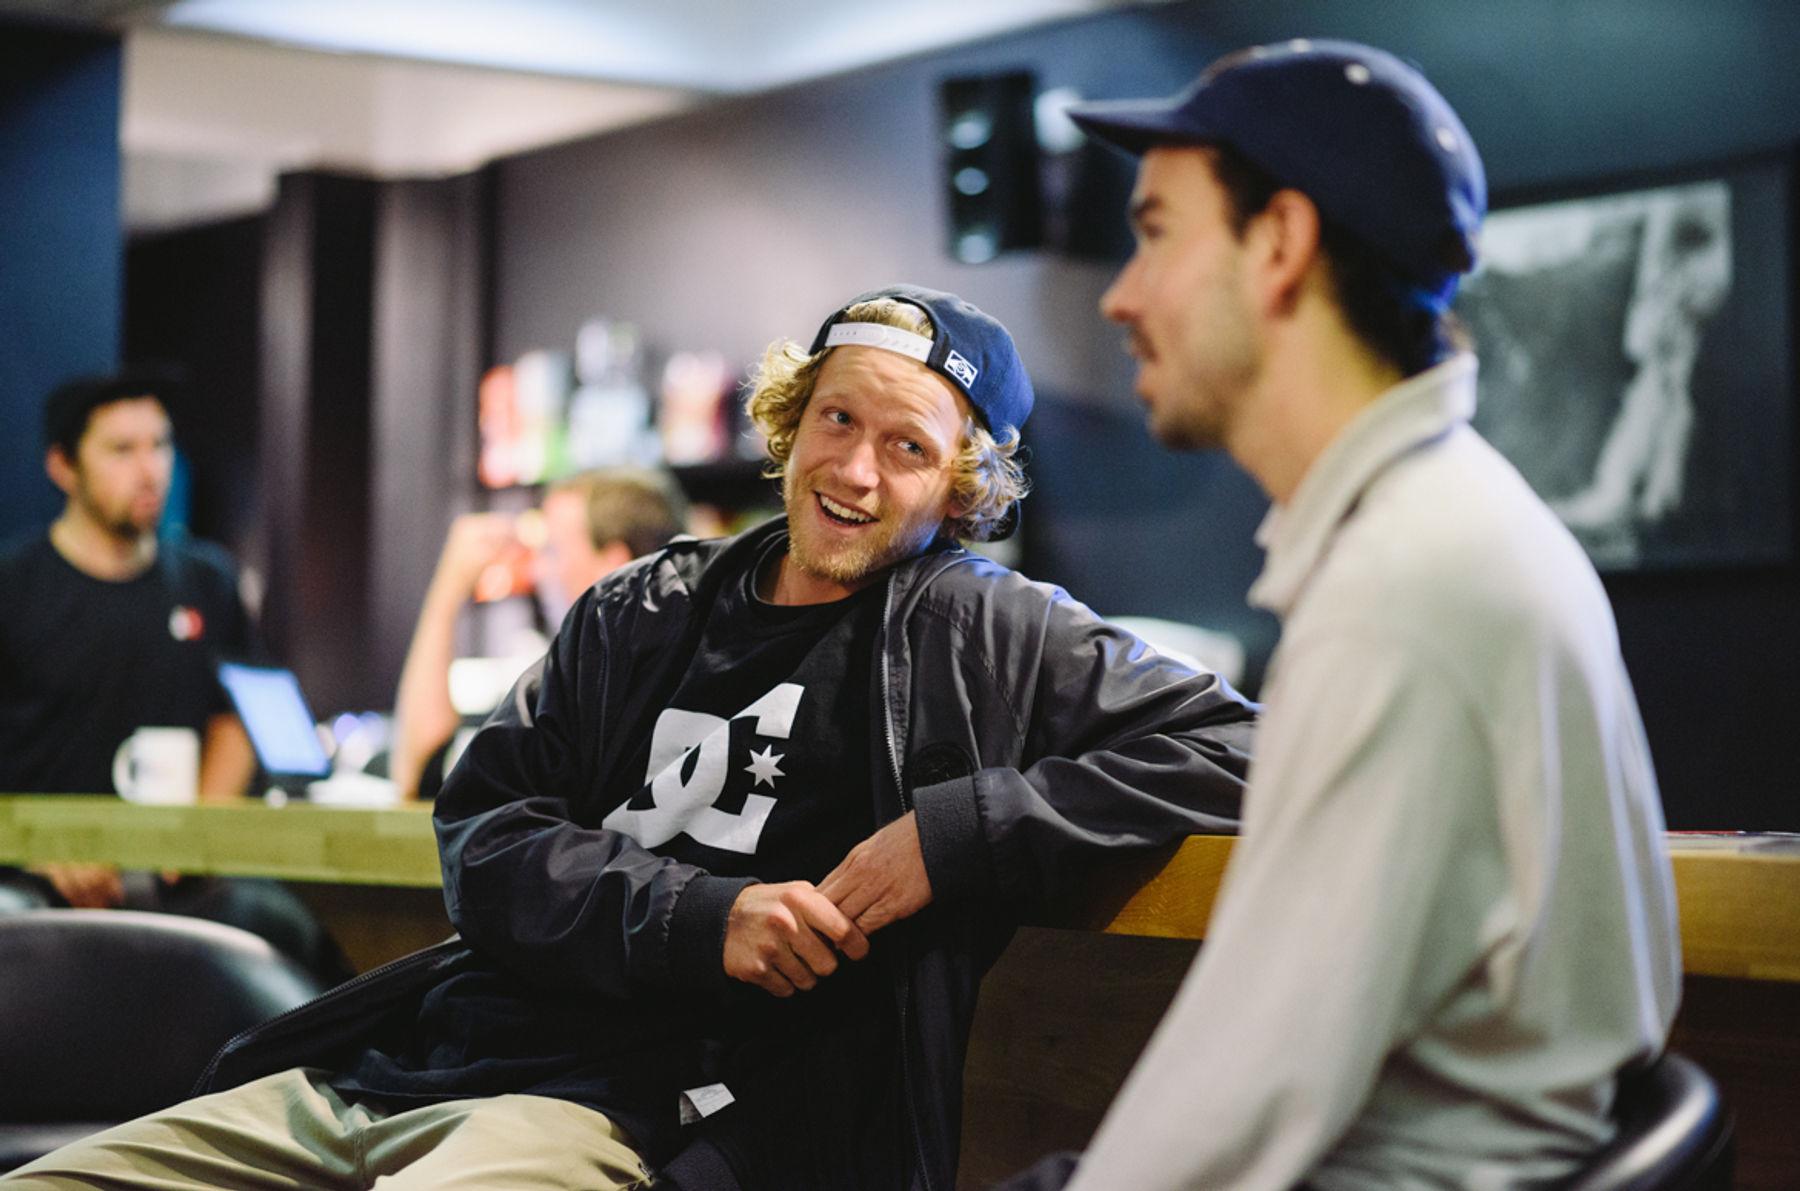 _IHC3312e-Wes-Kremer-Arthur-Derrien-DC-Special-Delivery-Skate-Tour-BTS-Interviews-London-May-2015-Photographer-Maksim-Kalanep